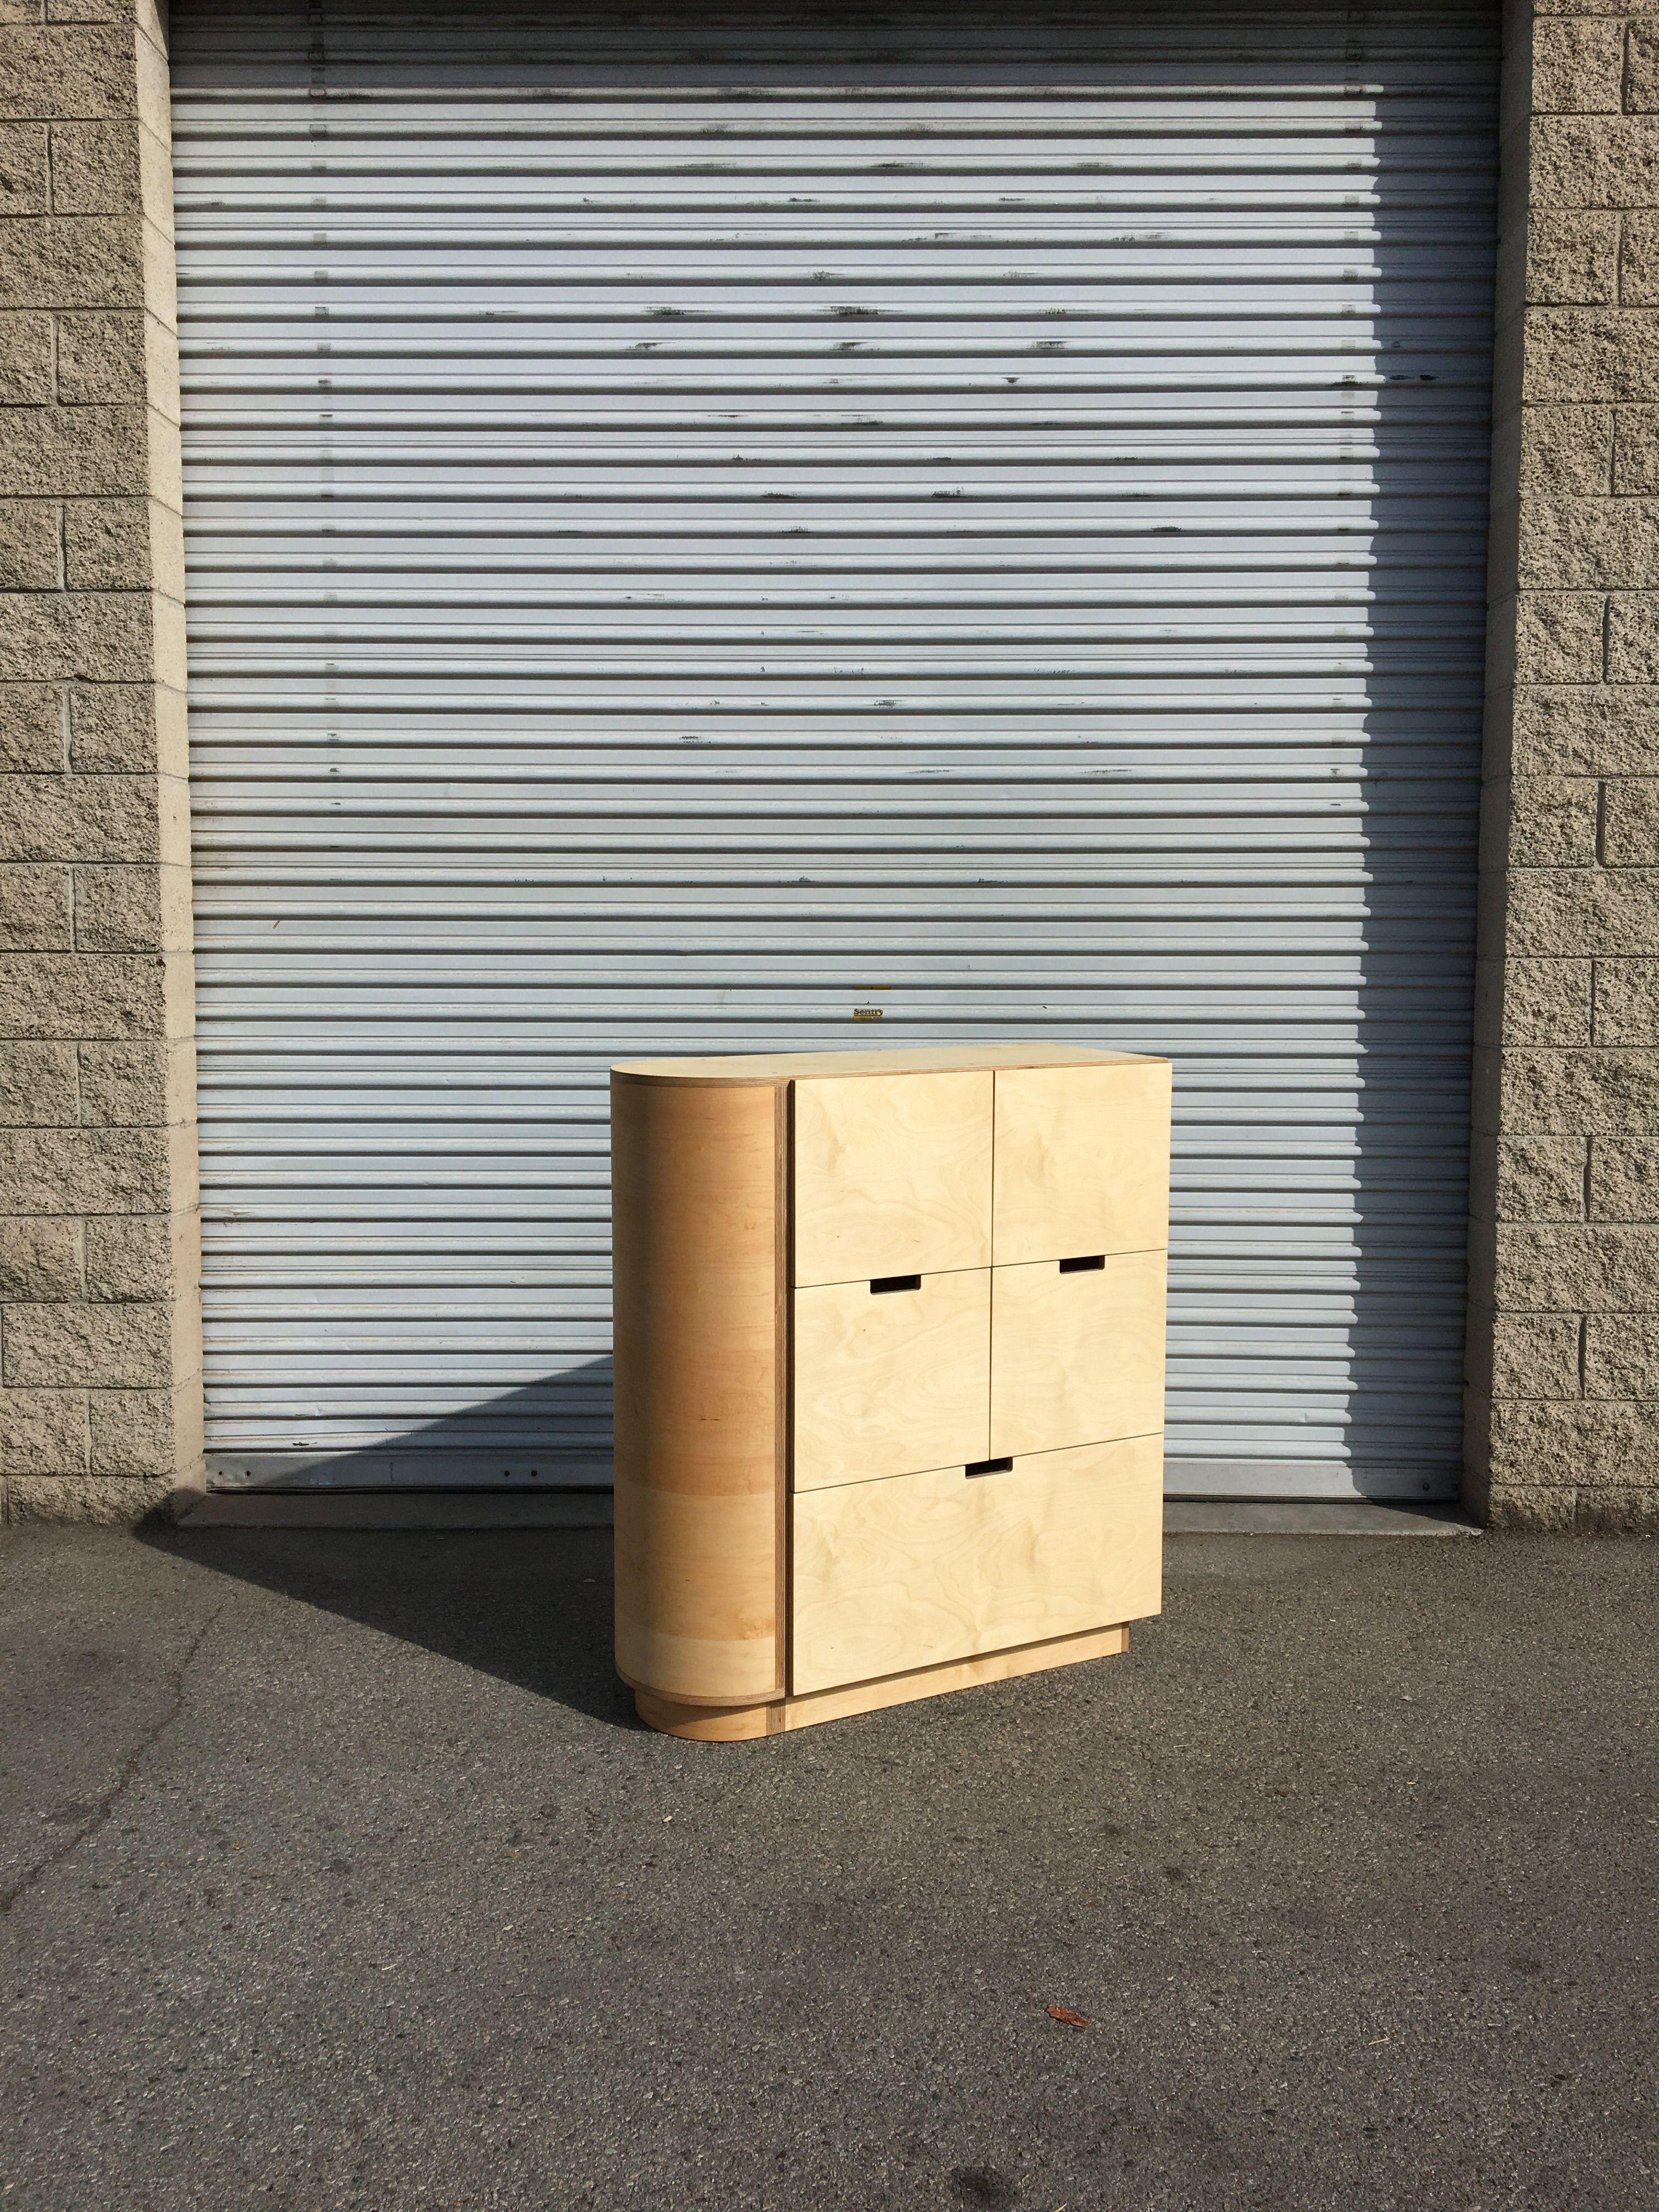 Half Round Dresser - Narrow product image 1